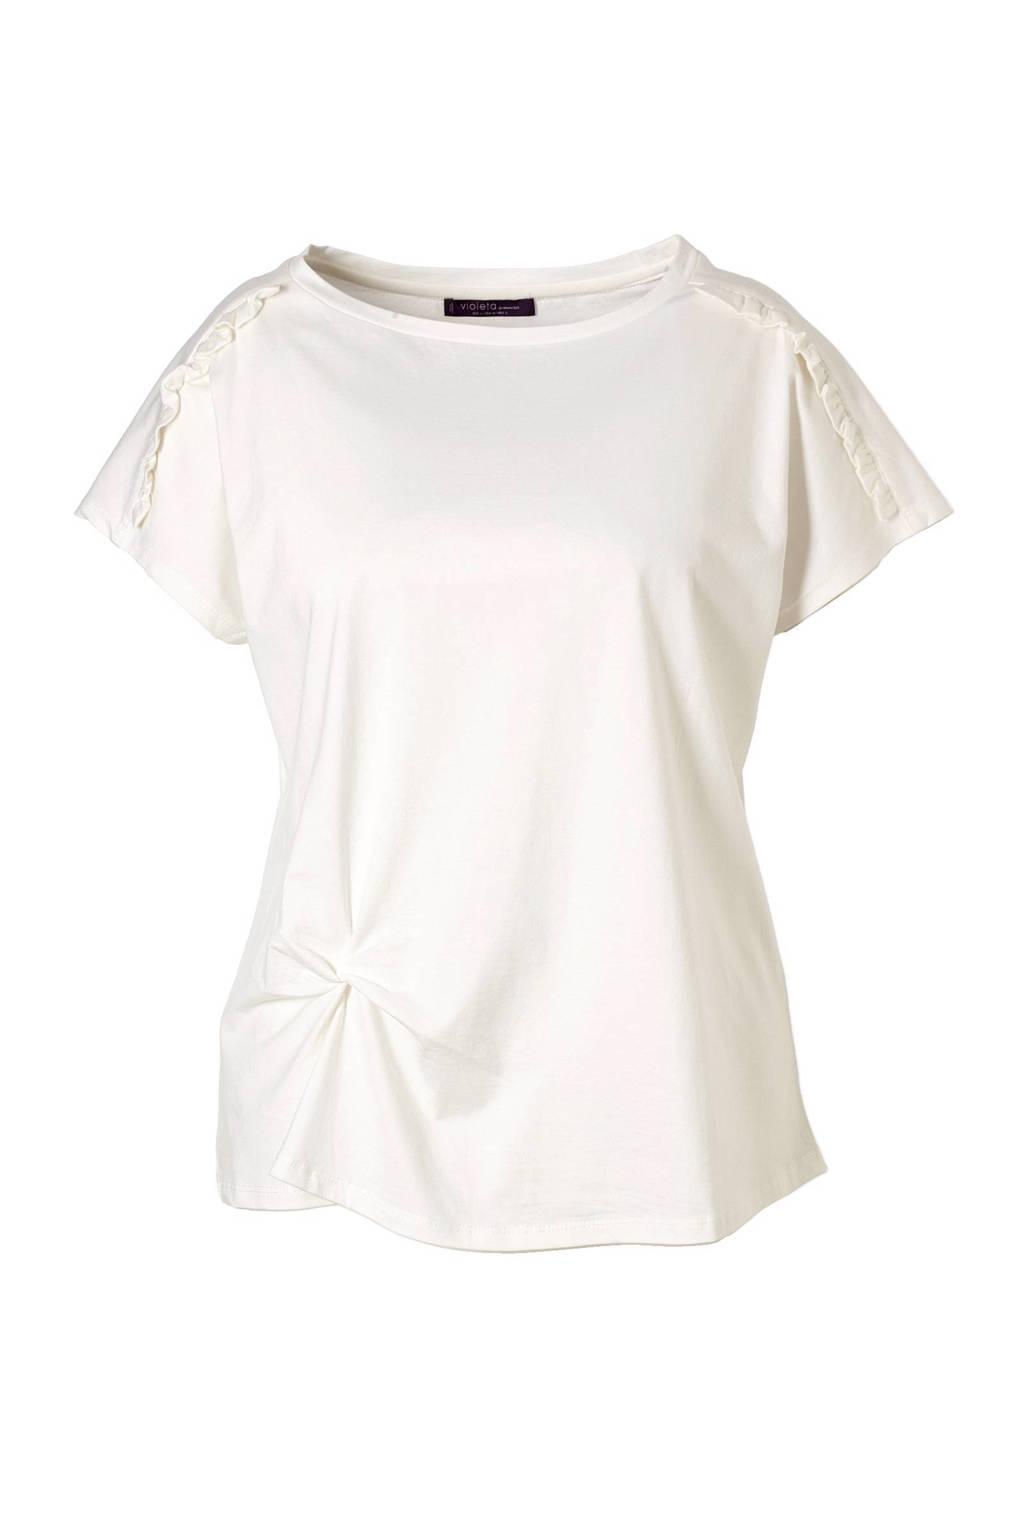 Violeta by Mango t-shirt, Gebroken wit